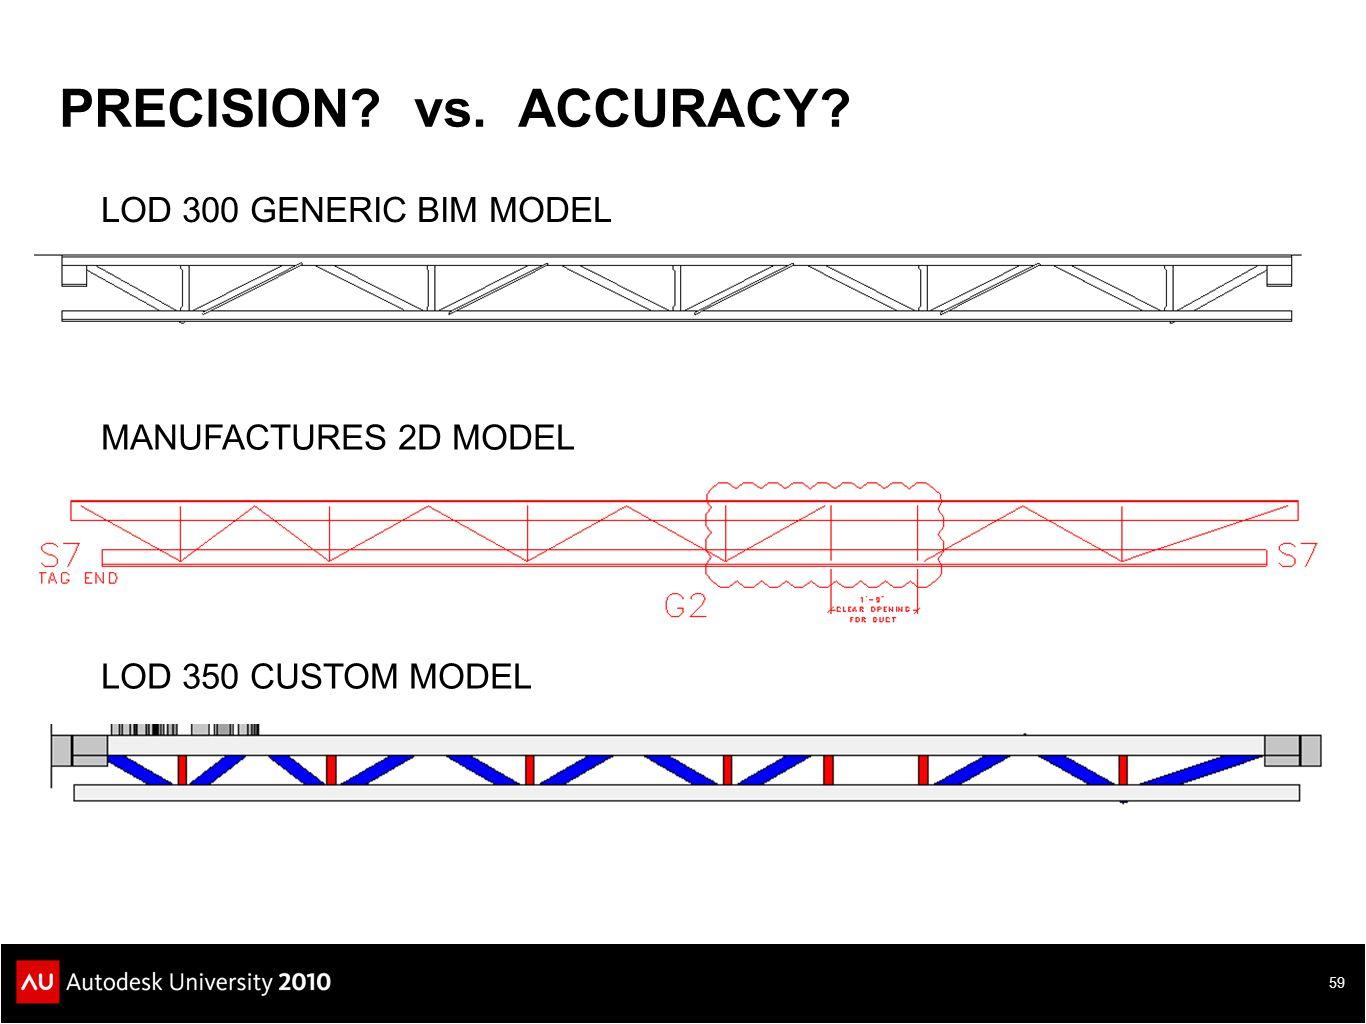 PRECISION vs. ACCURACY LOD 300 GENERIC BIM MODEL